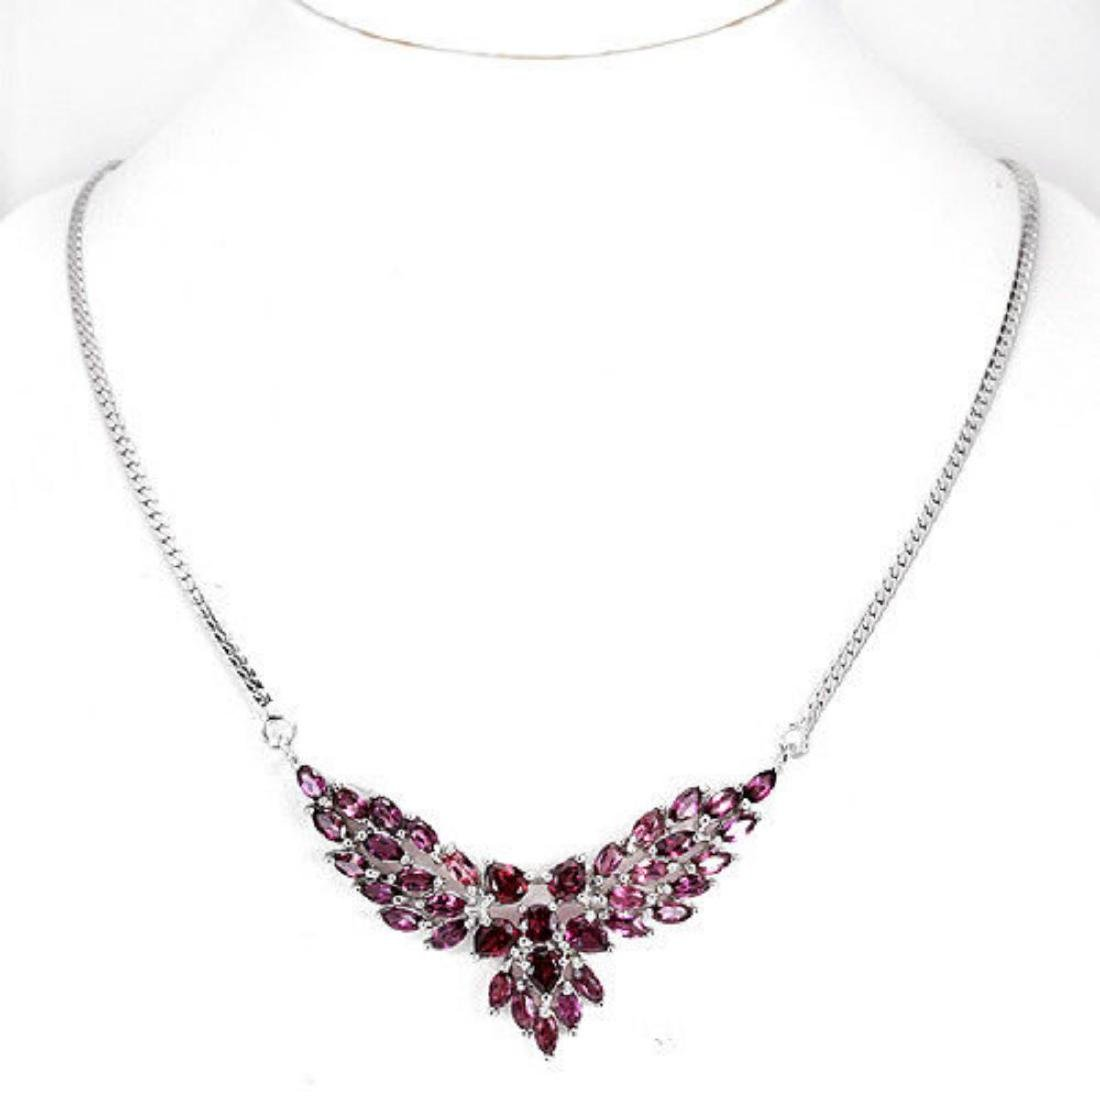 NATURAL PURPLE PINK RHODOLITE GARNET Necklace - 2